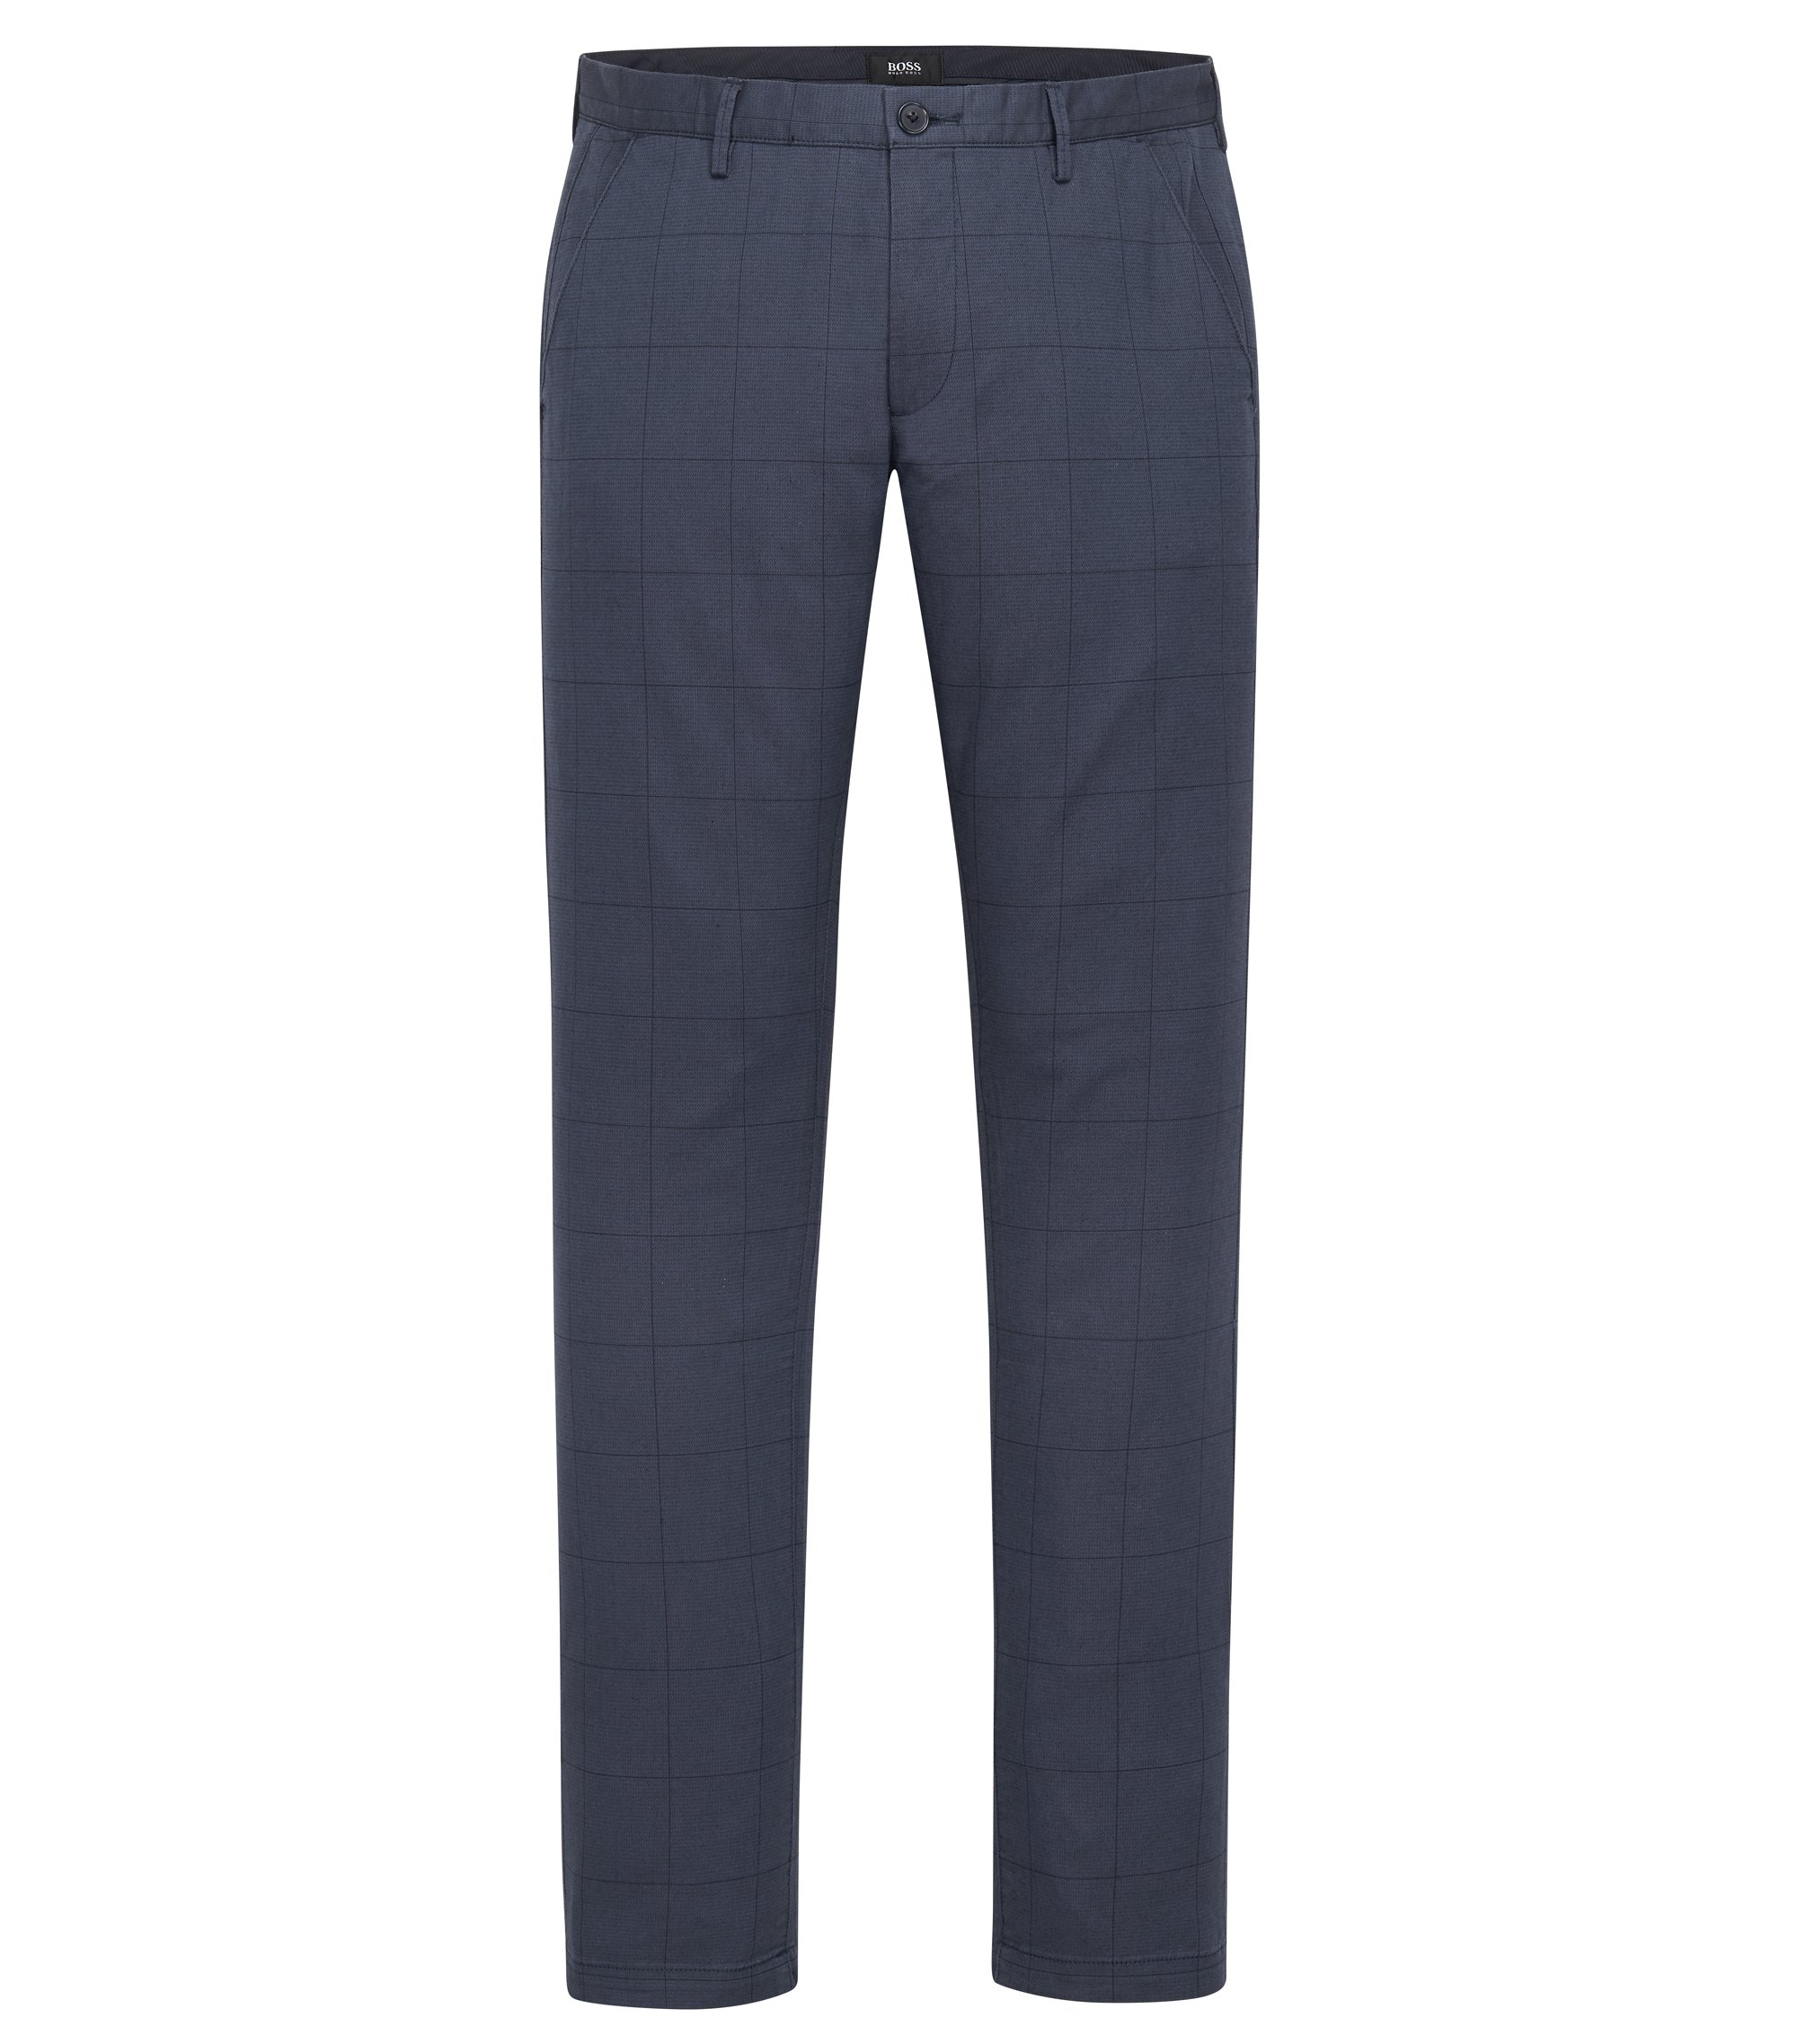 Windowpane Stretch Cotton Pant, Slim Fit | Rice W, Dark Blue